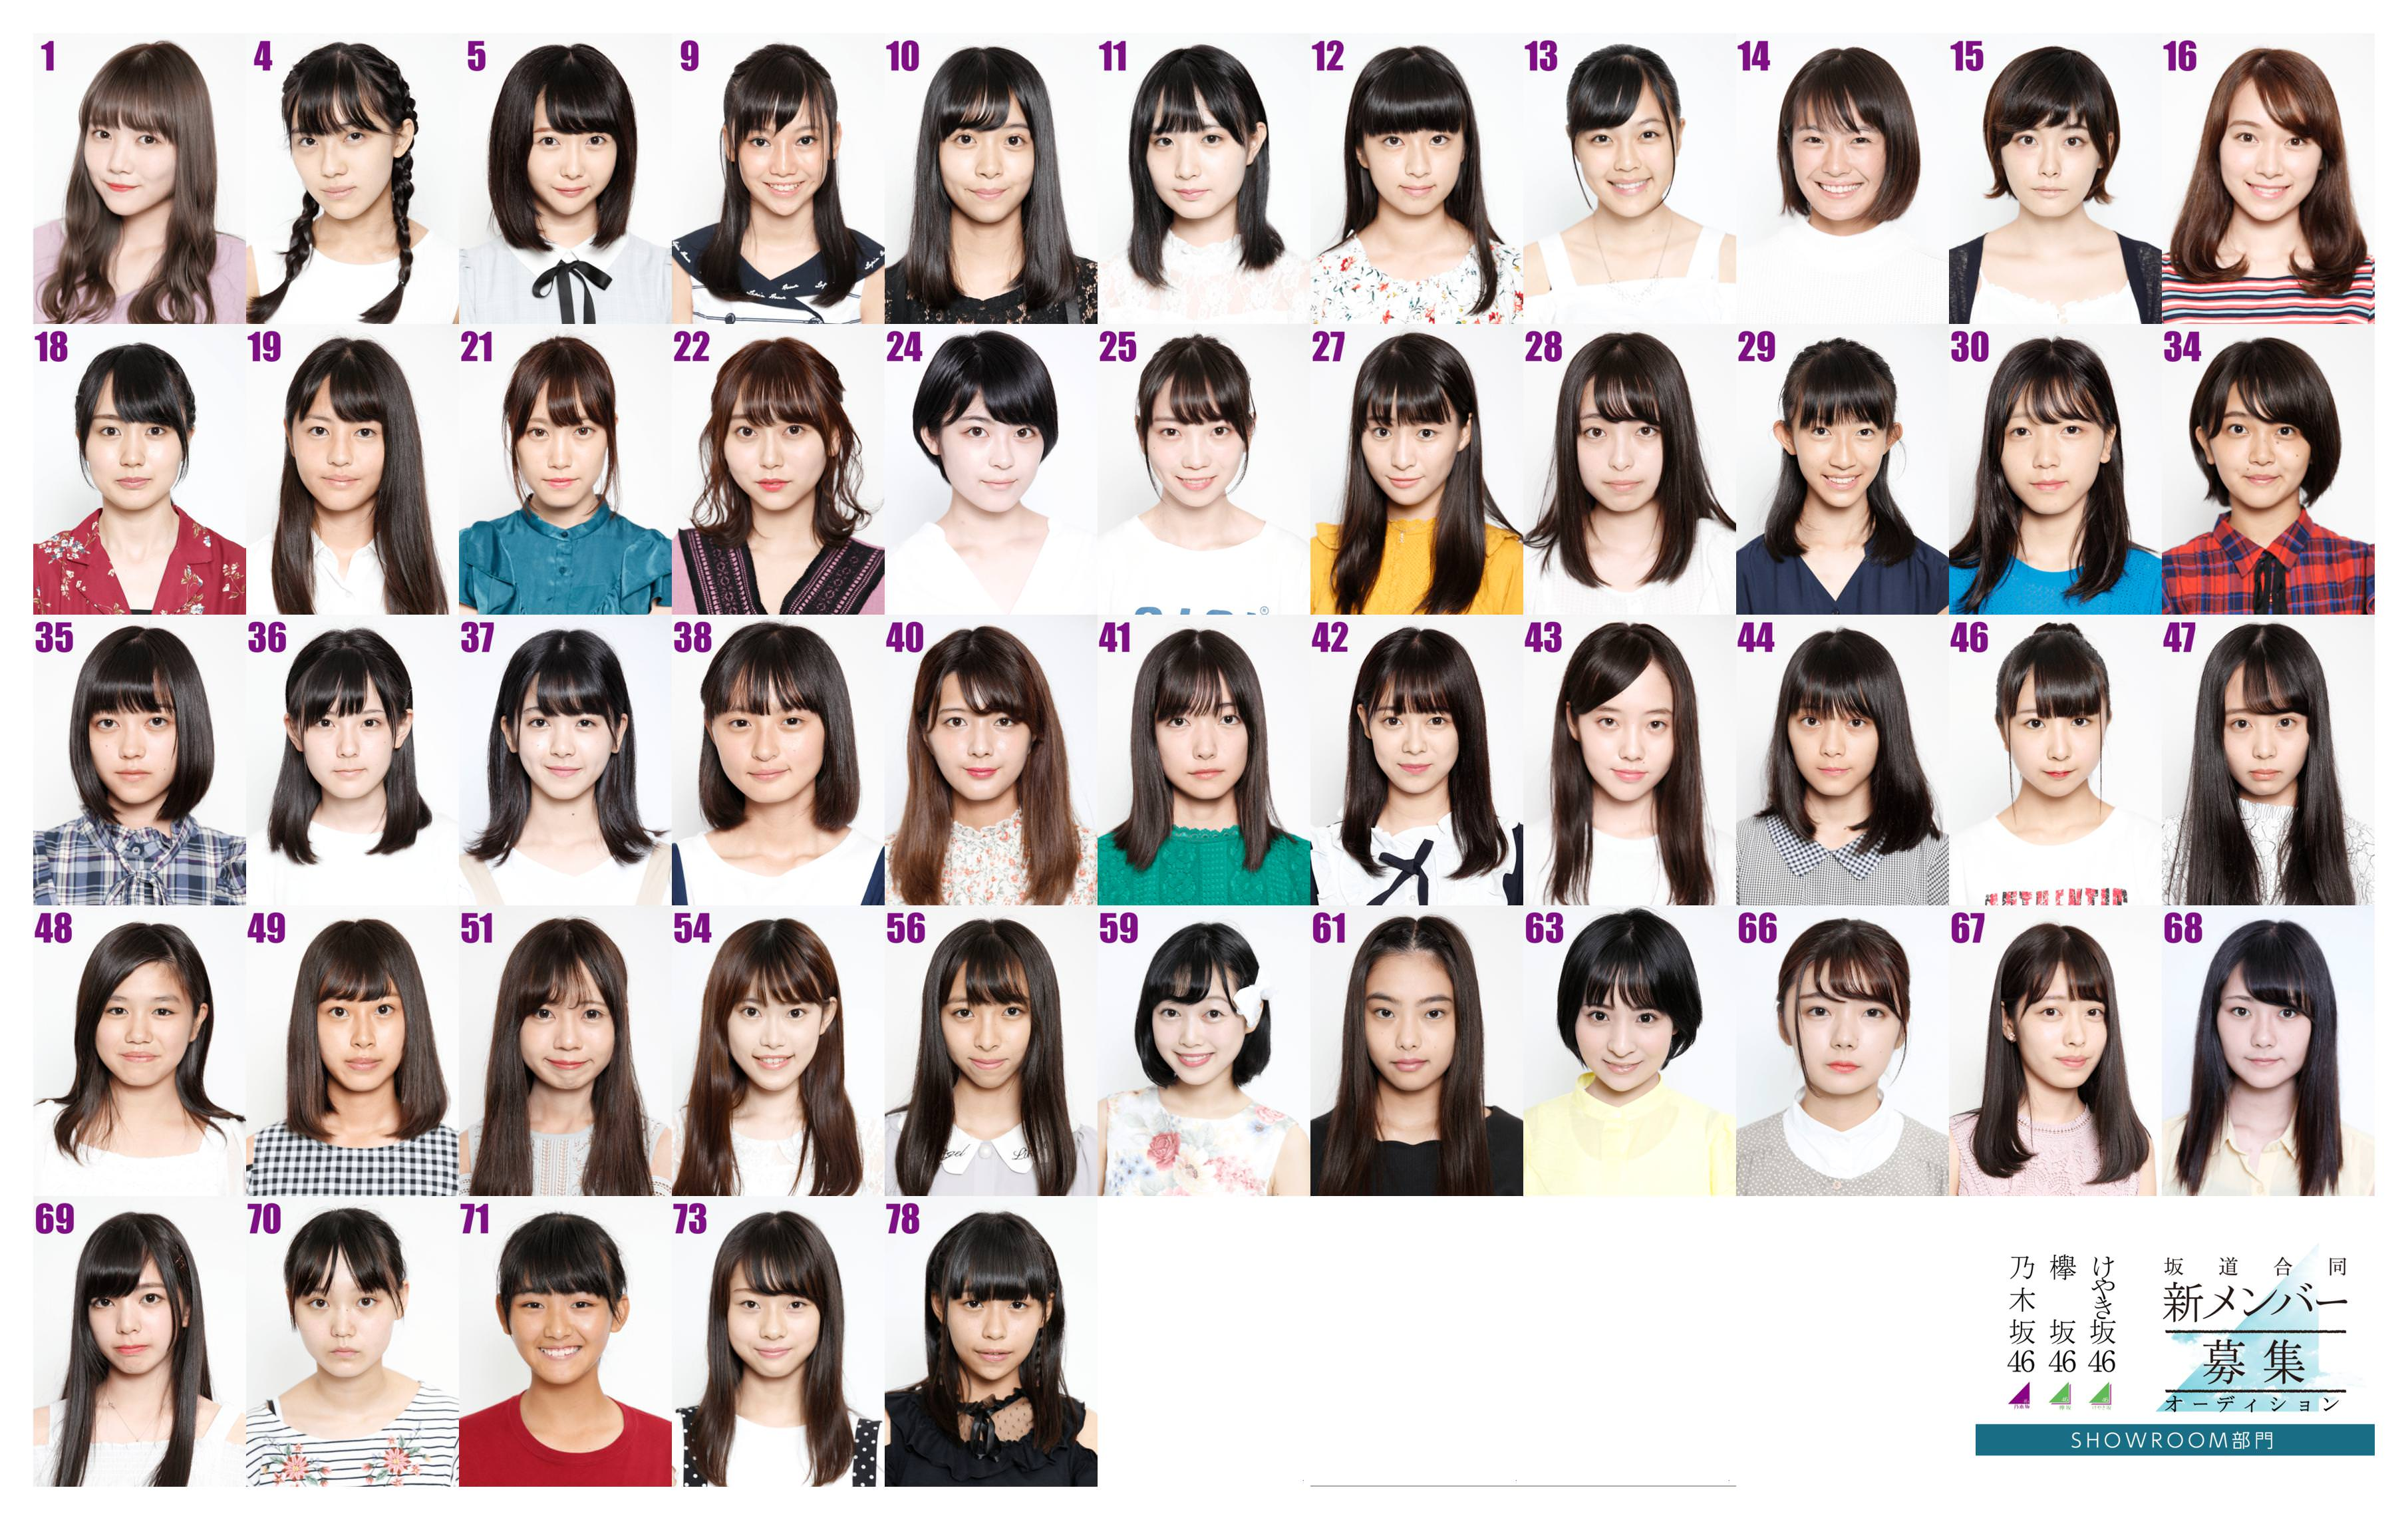 AKB48Gヲタが選ぶ坂道合同オーディションの逸材は誰? 他